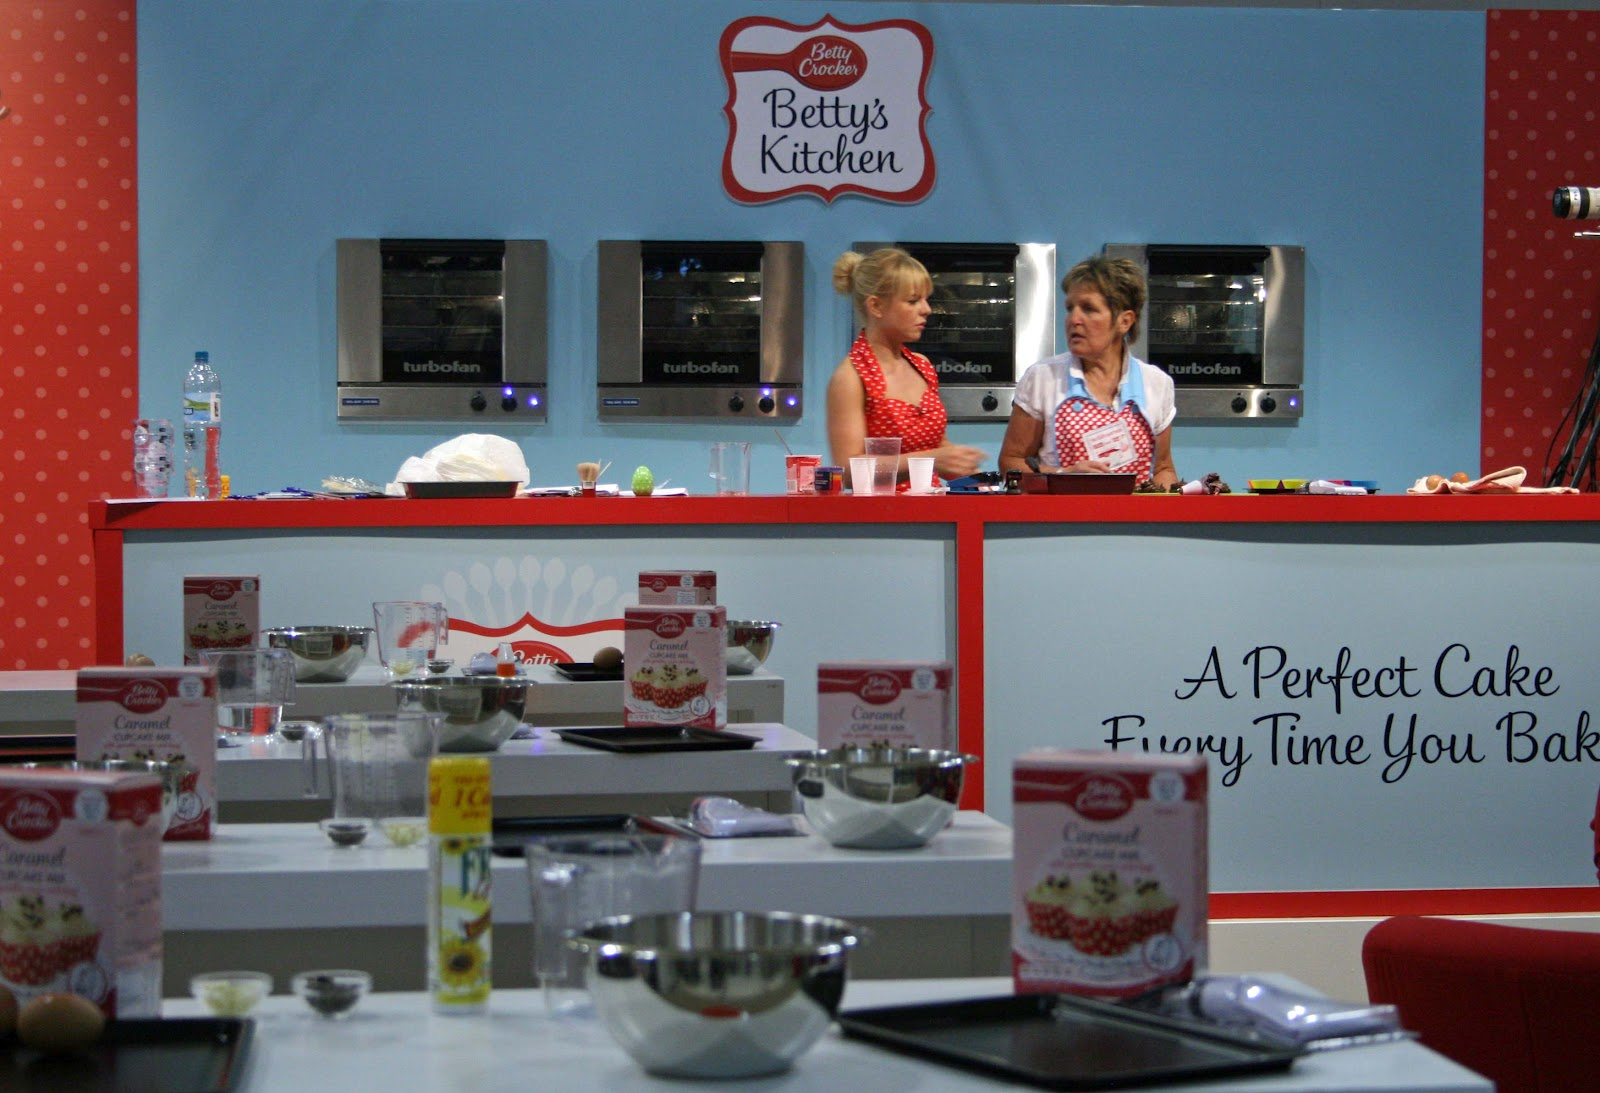 lauralovescakes...: Cake & Bake Show